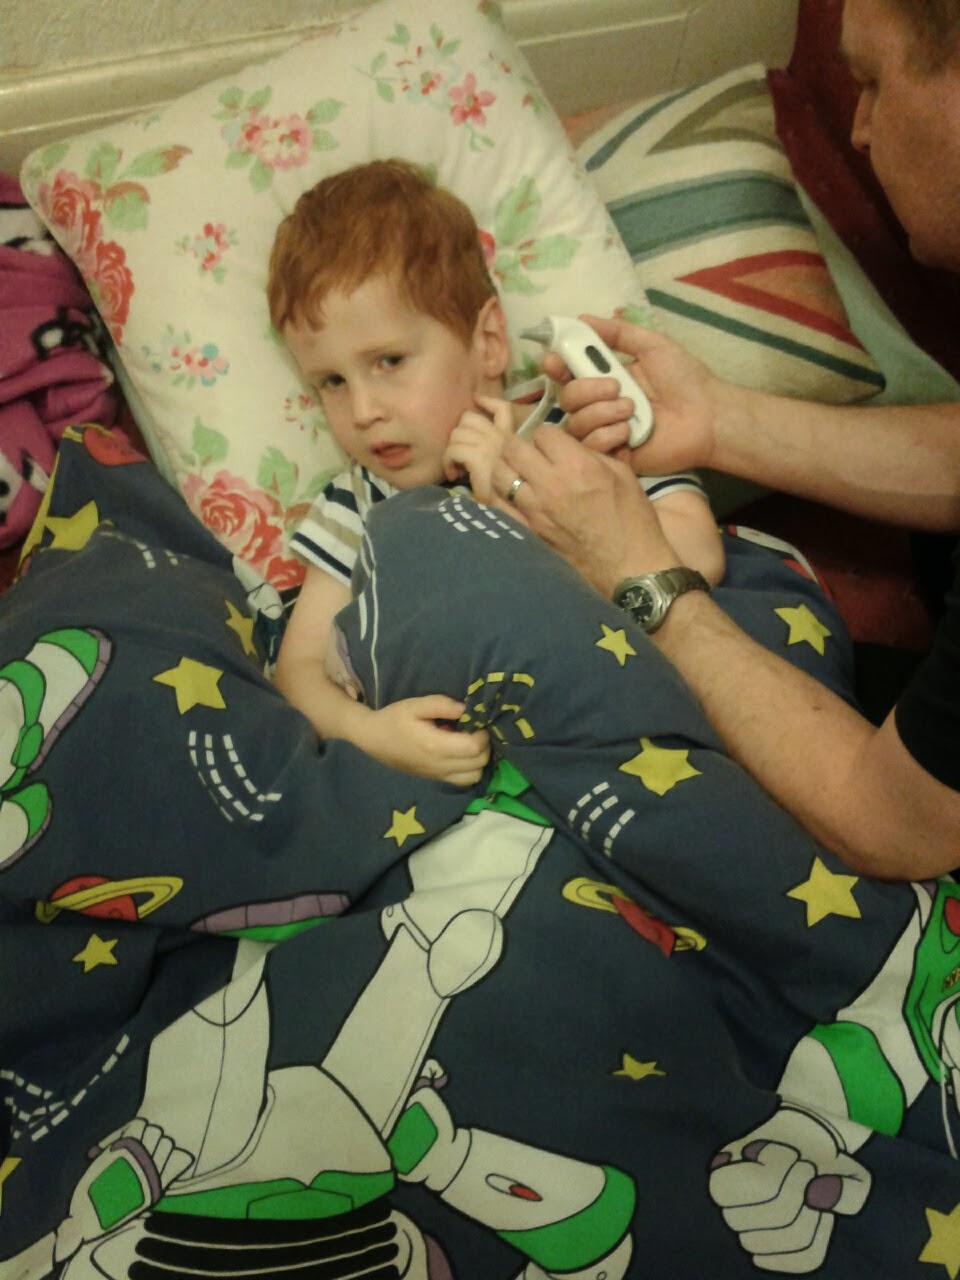 Parenting ill children - motherdistracted.co.uk